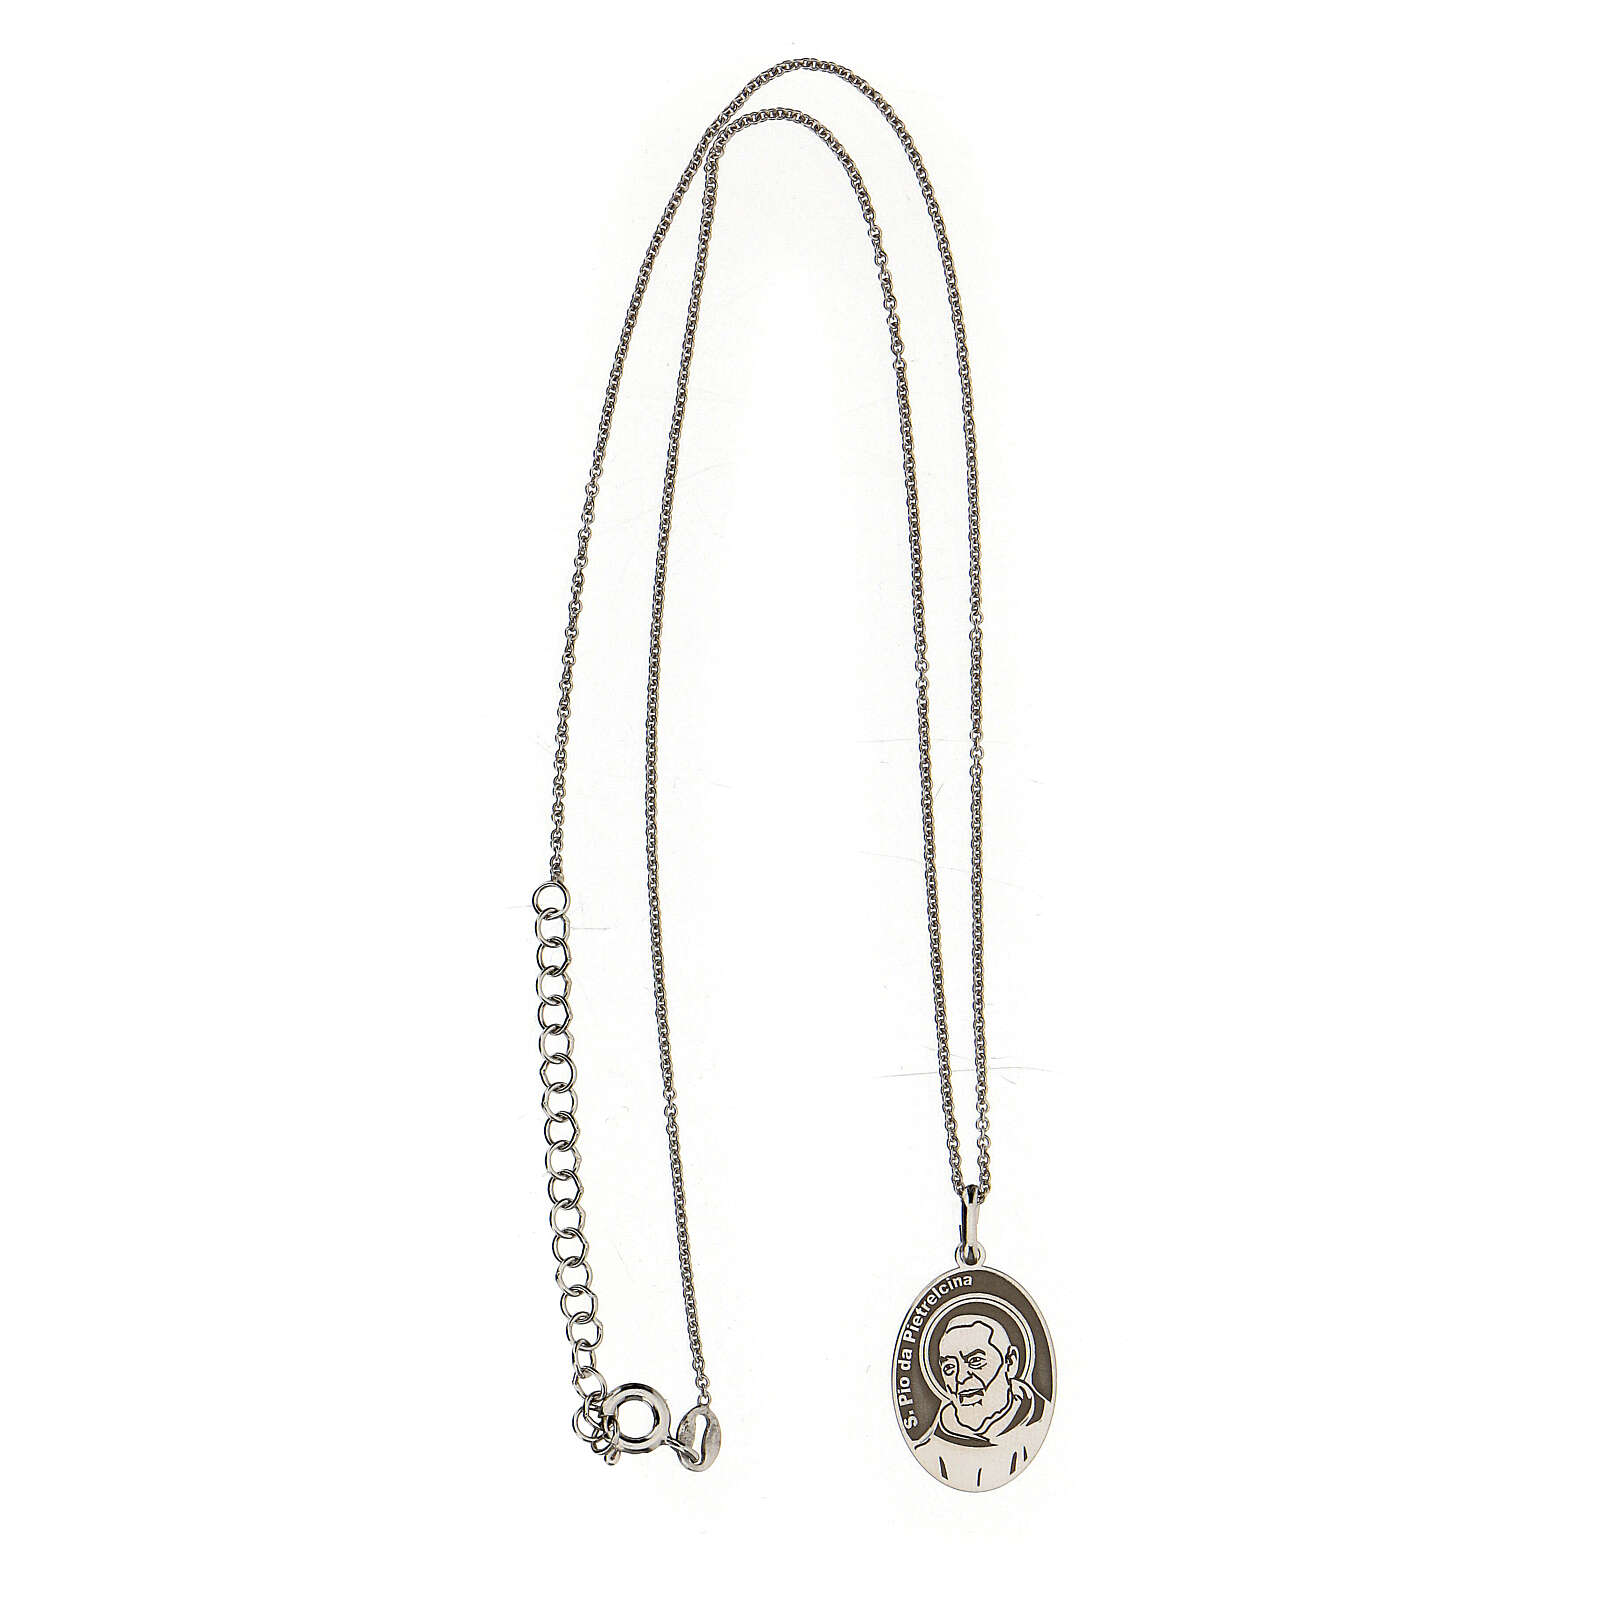 Collana San Pio ovale argento 925 4